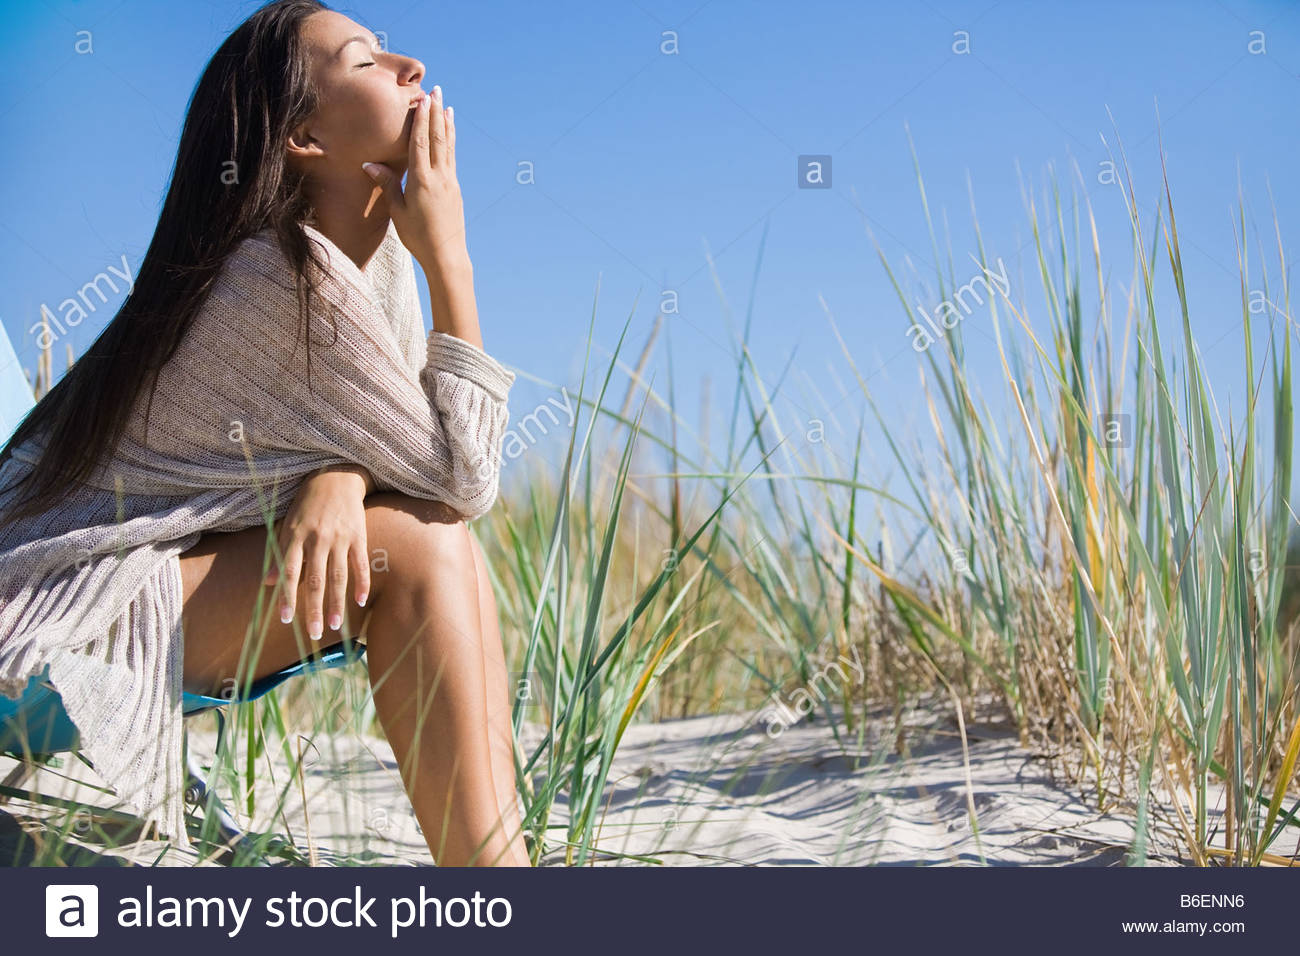 Woman alone o beach - Stock Image